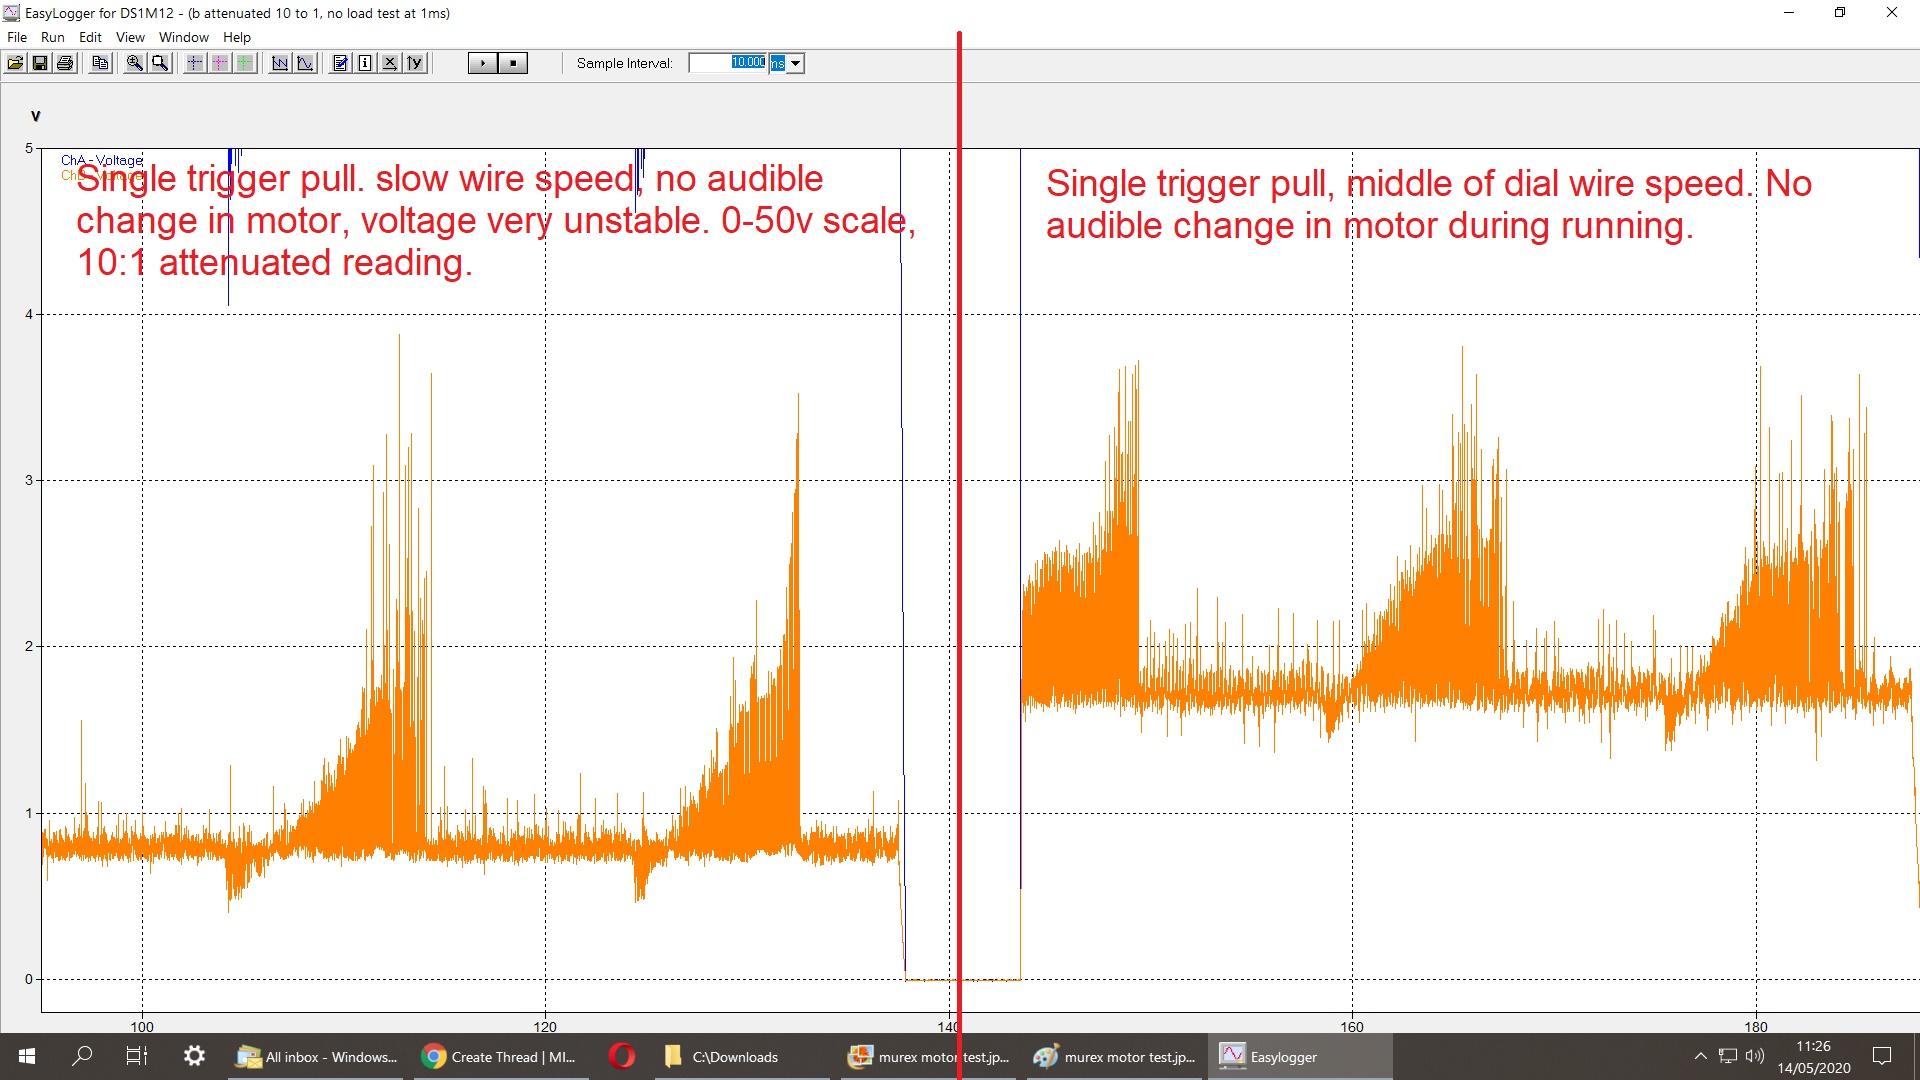 murex motor test.jpg